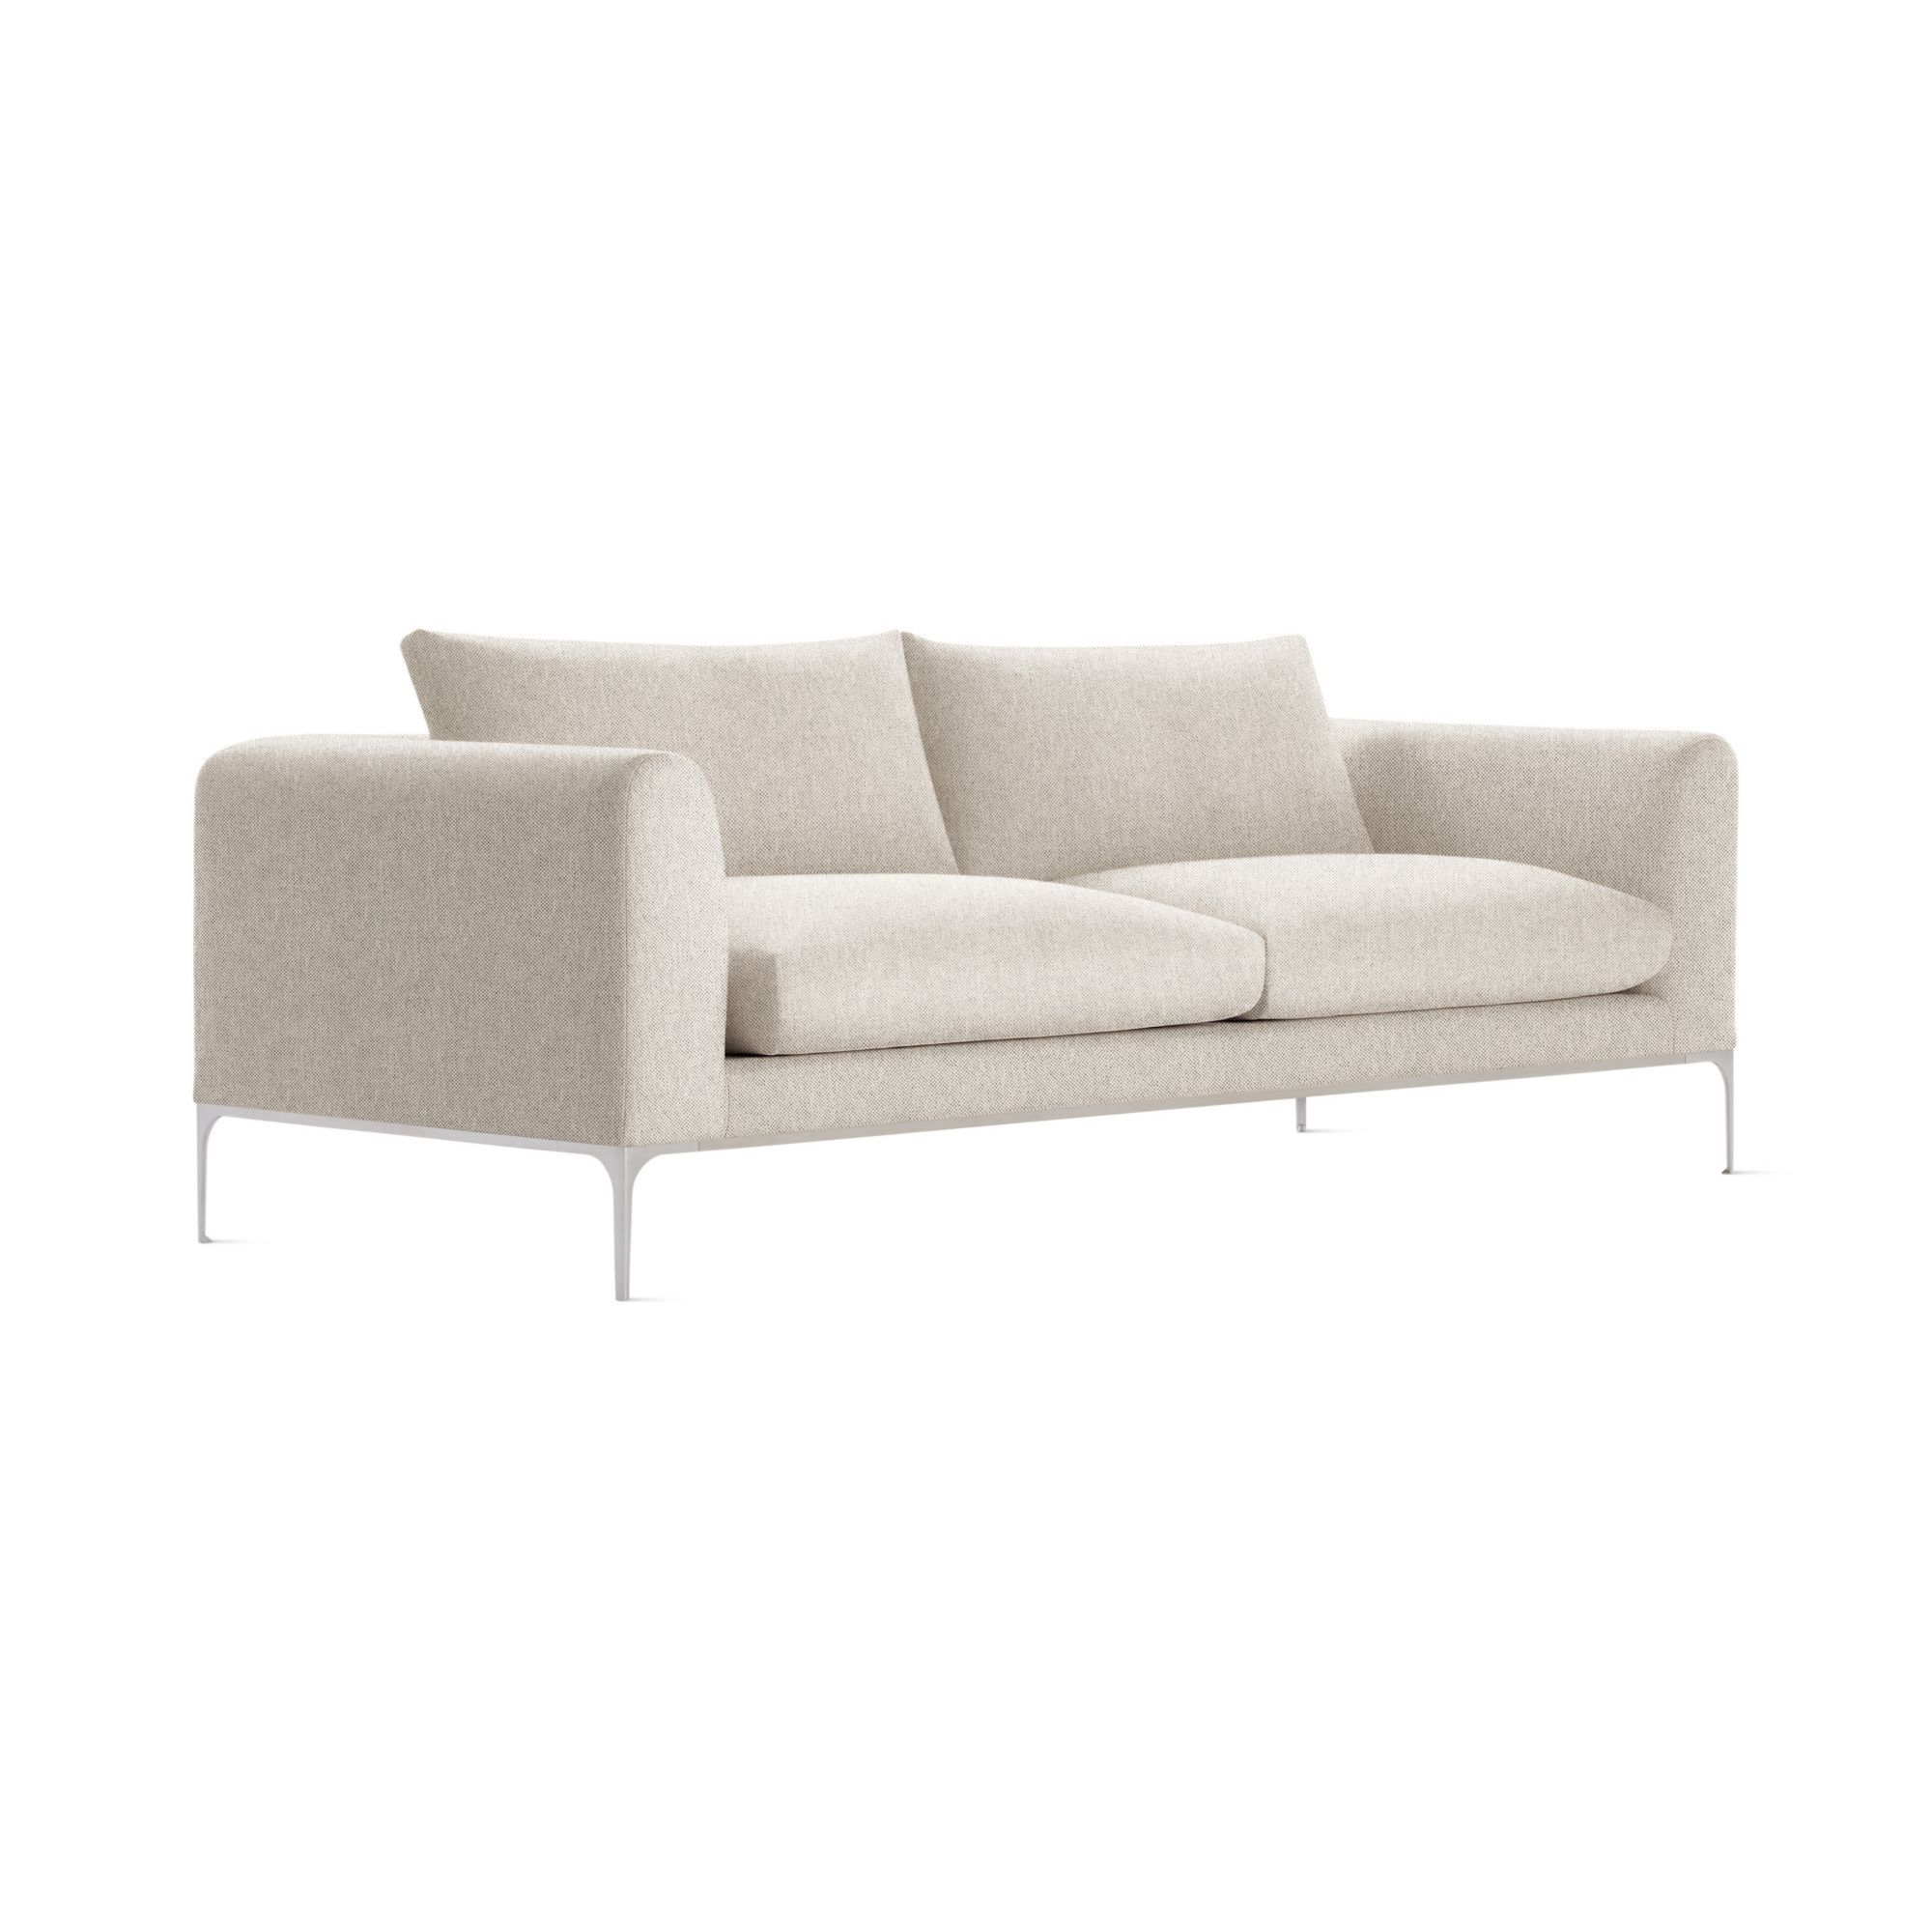 Jonas Sofa In 2020 Sofa Design Sofa Design Within Reach